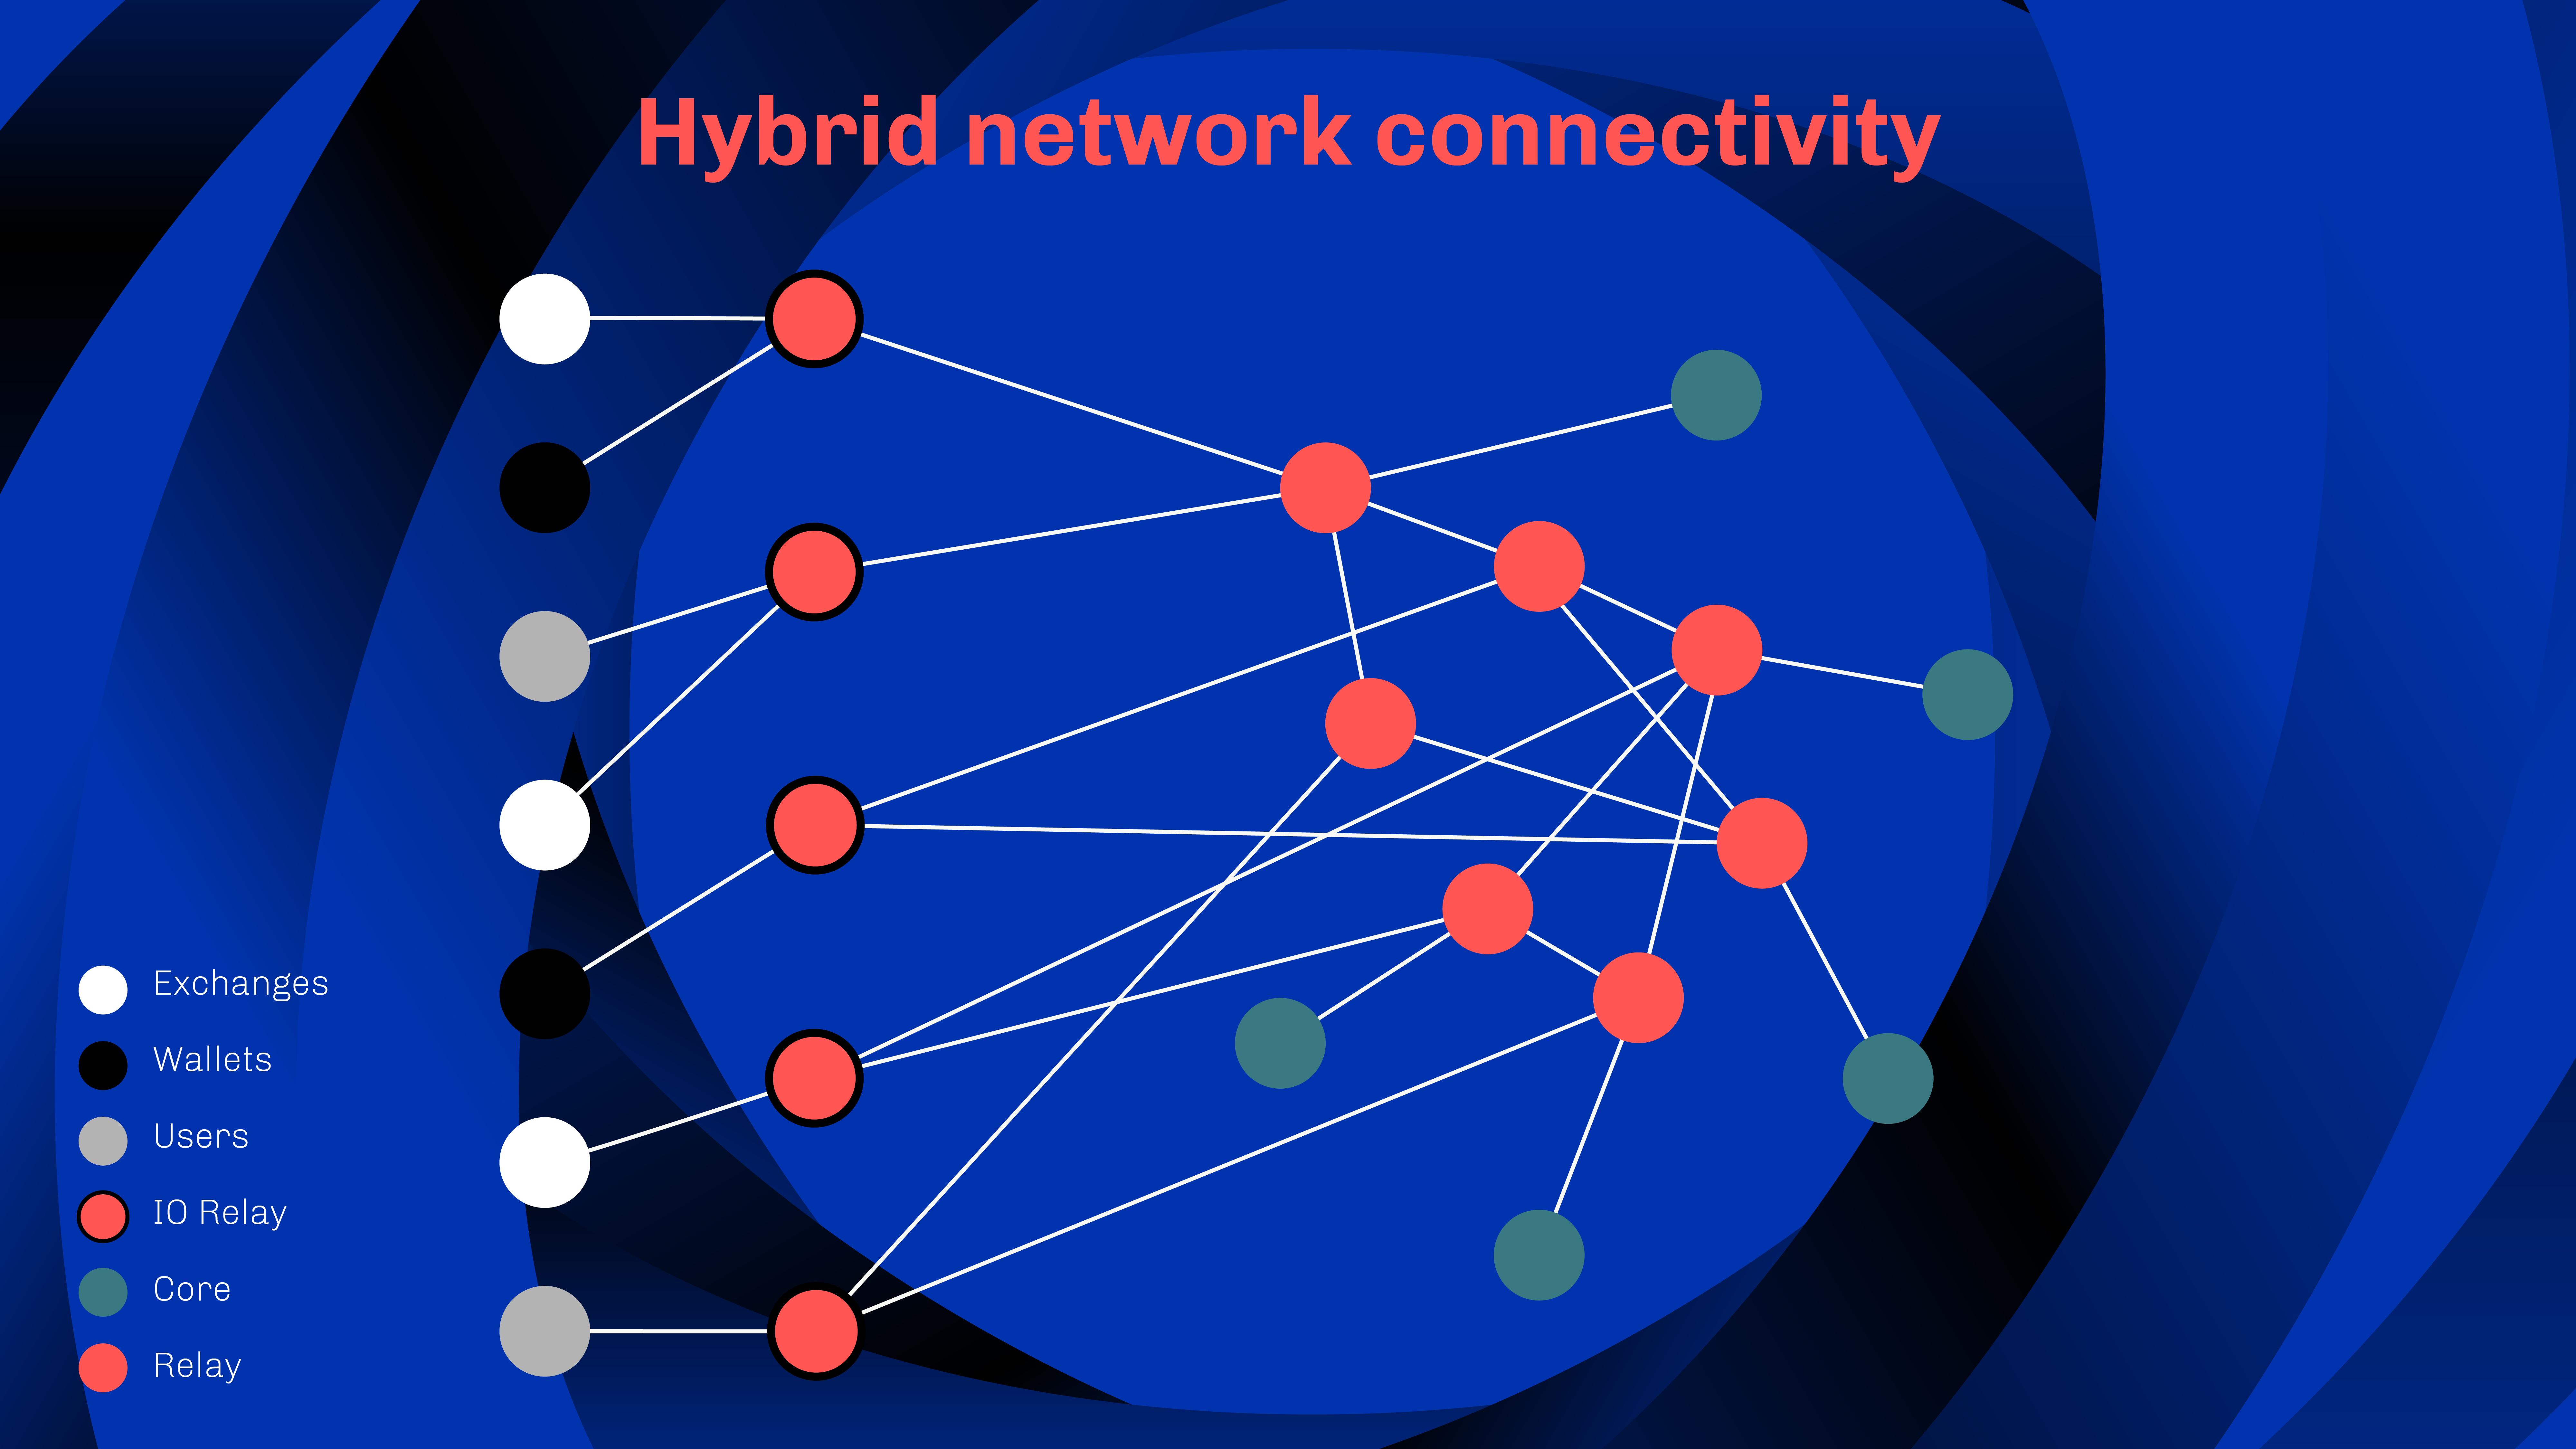 Hybrid network connectivity